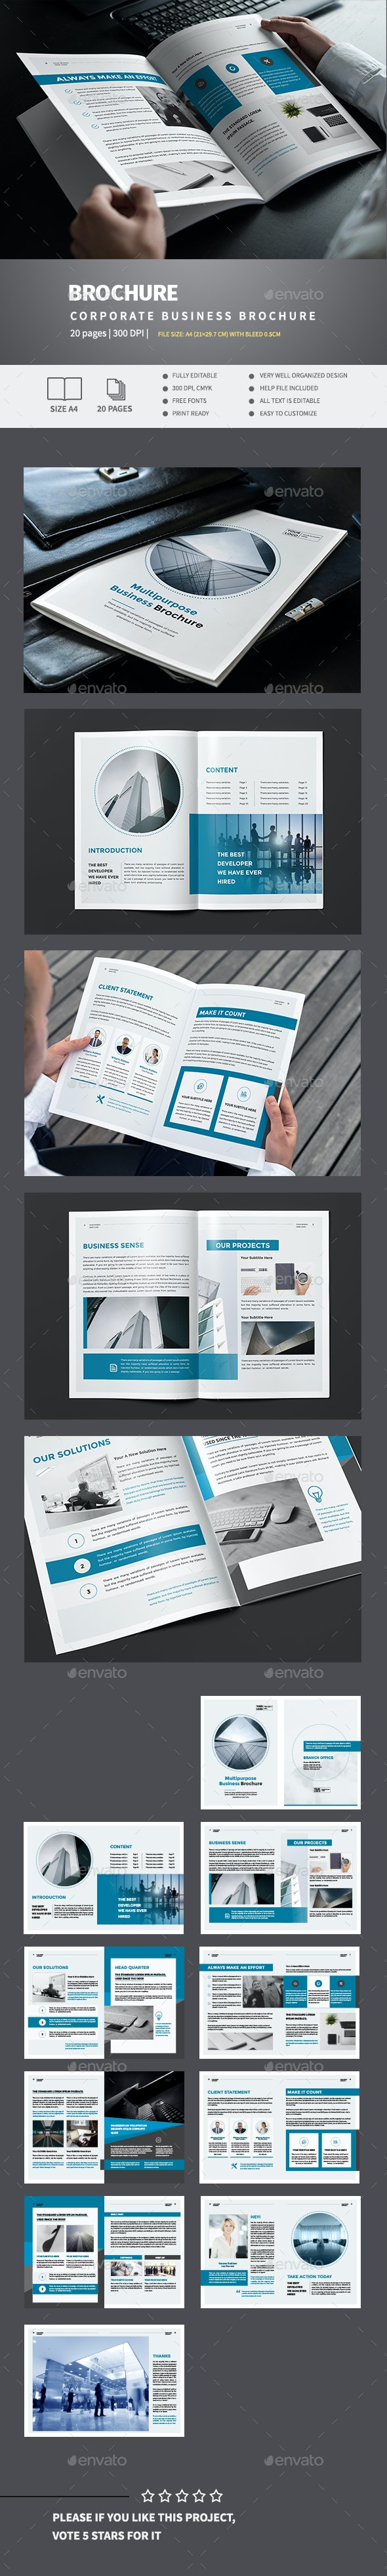 Blue Business Brochure Template - Corporate Brochures